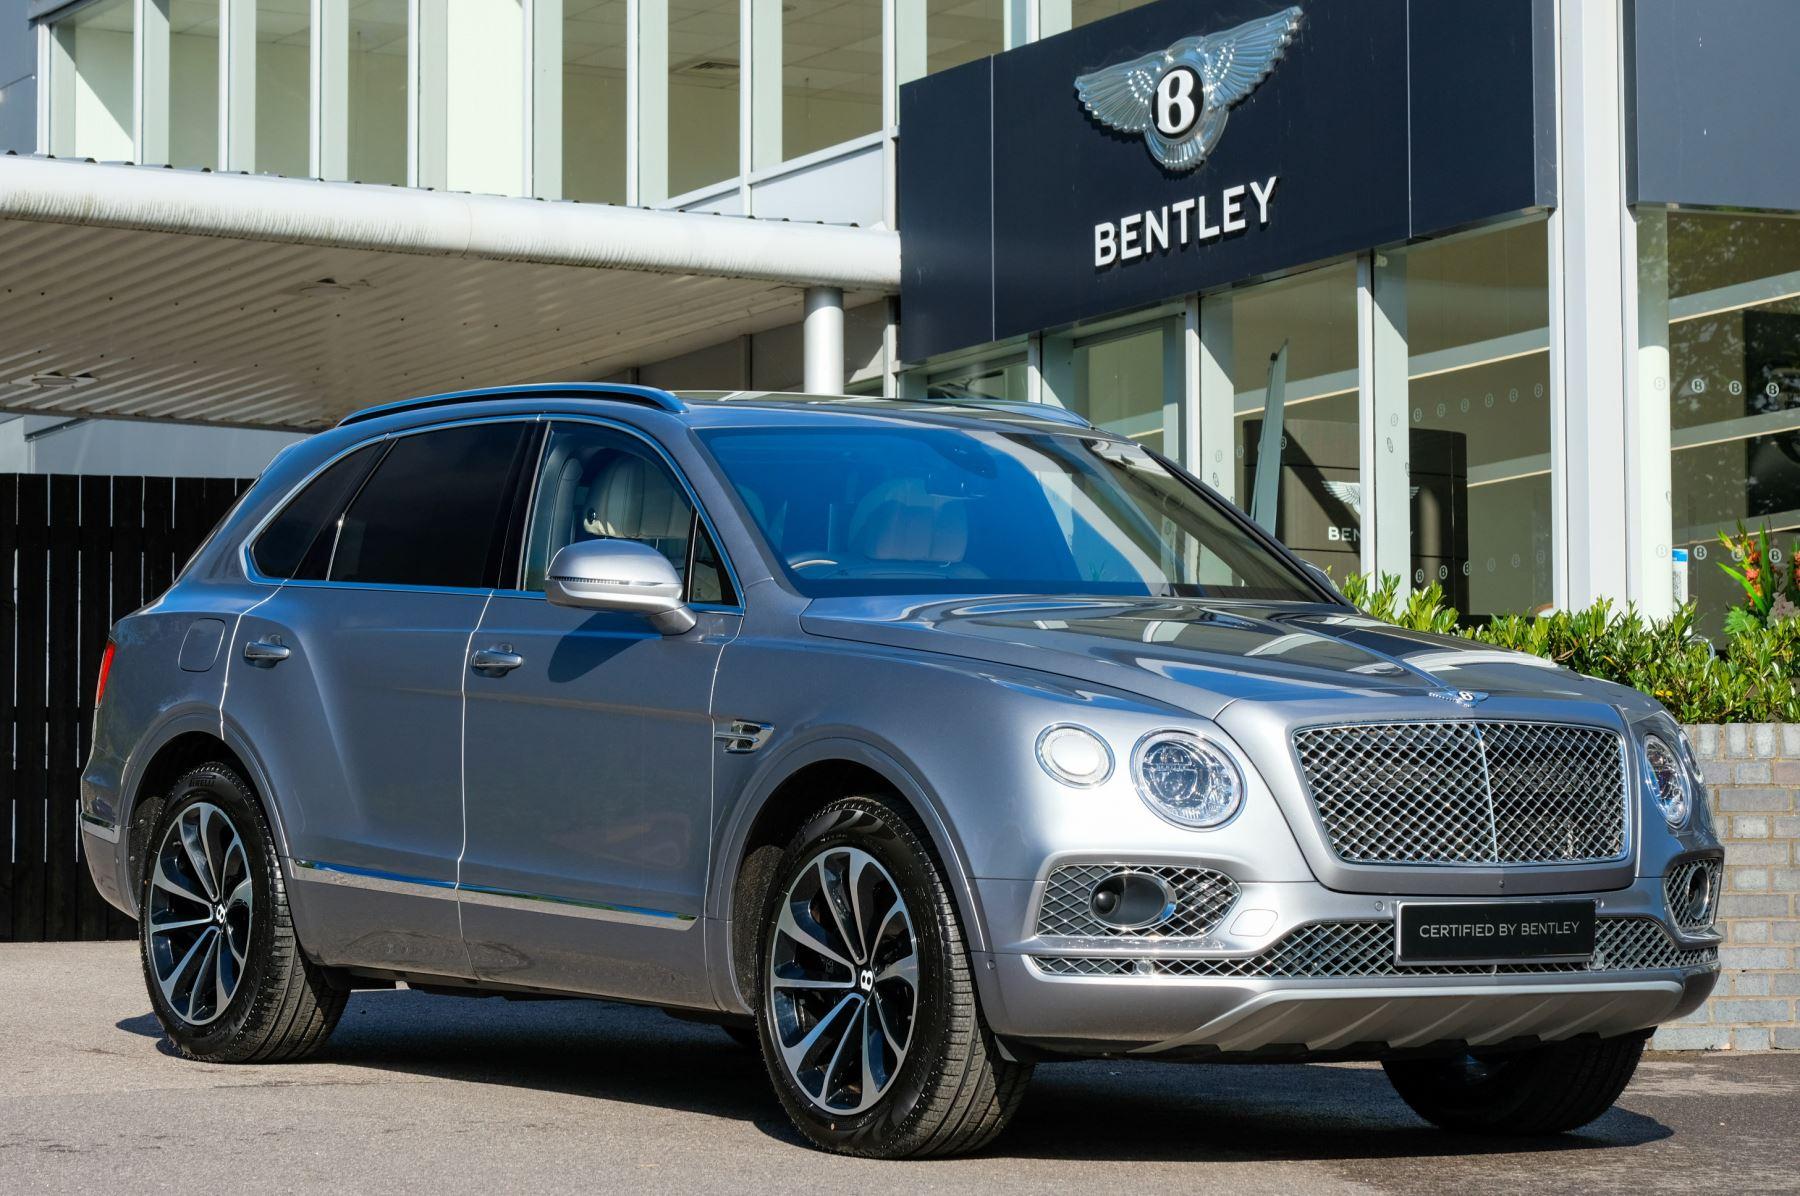 Bentley Bentayga 6.0 W12 - Mulliner, City, Touring & All Terrain Specification Automatic 5 door Estate